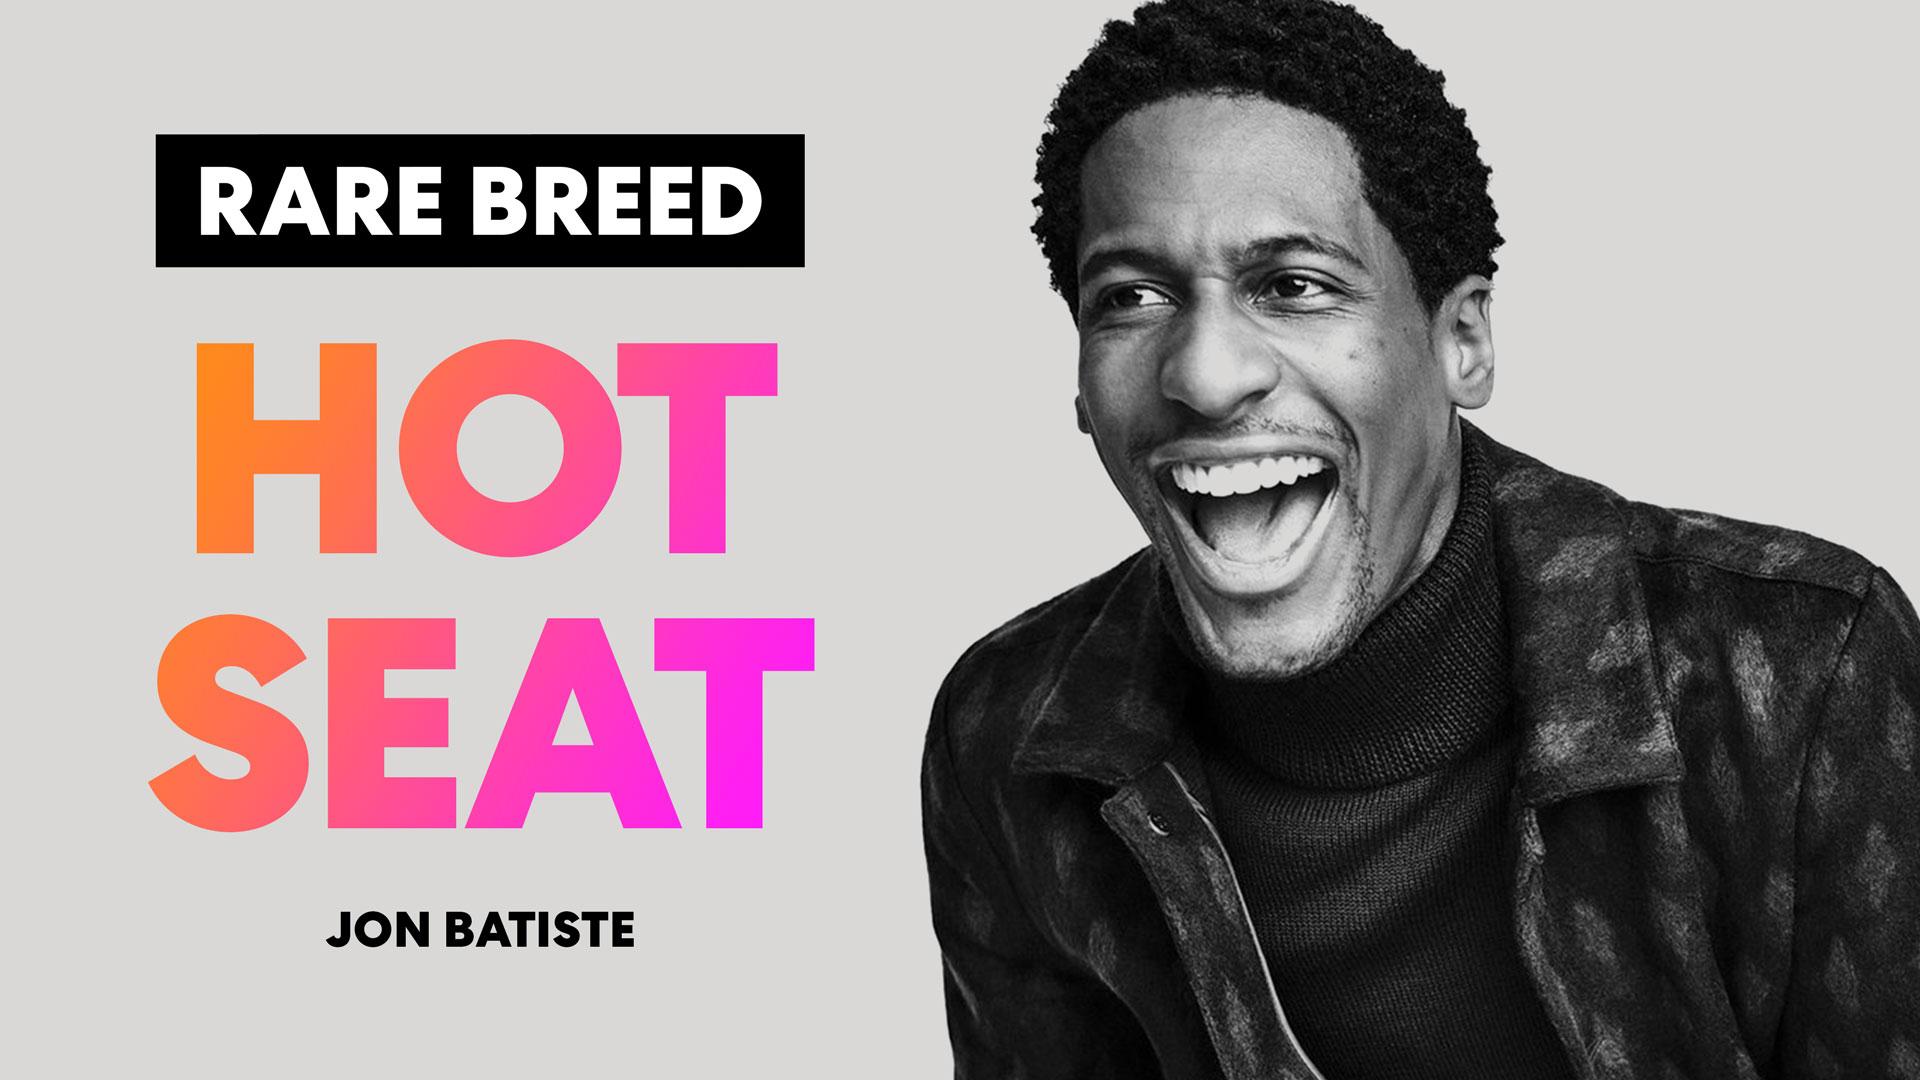 hot seat jon batiste rare breed